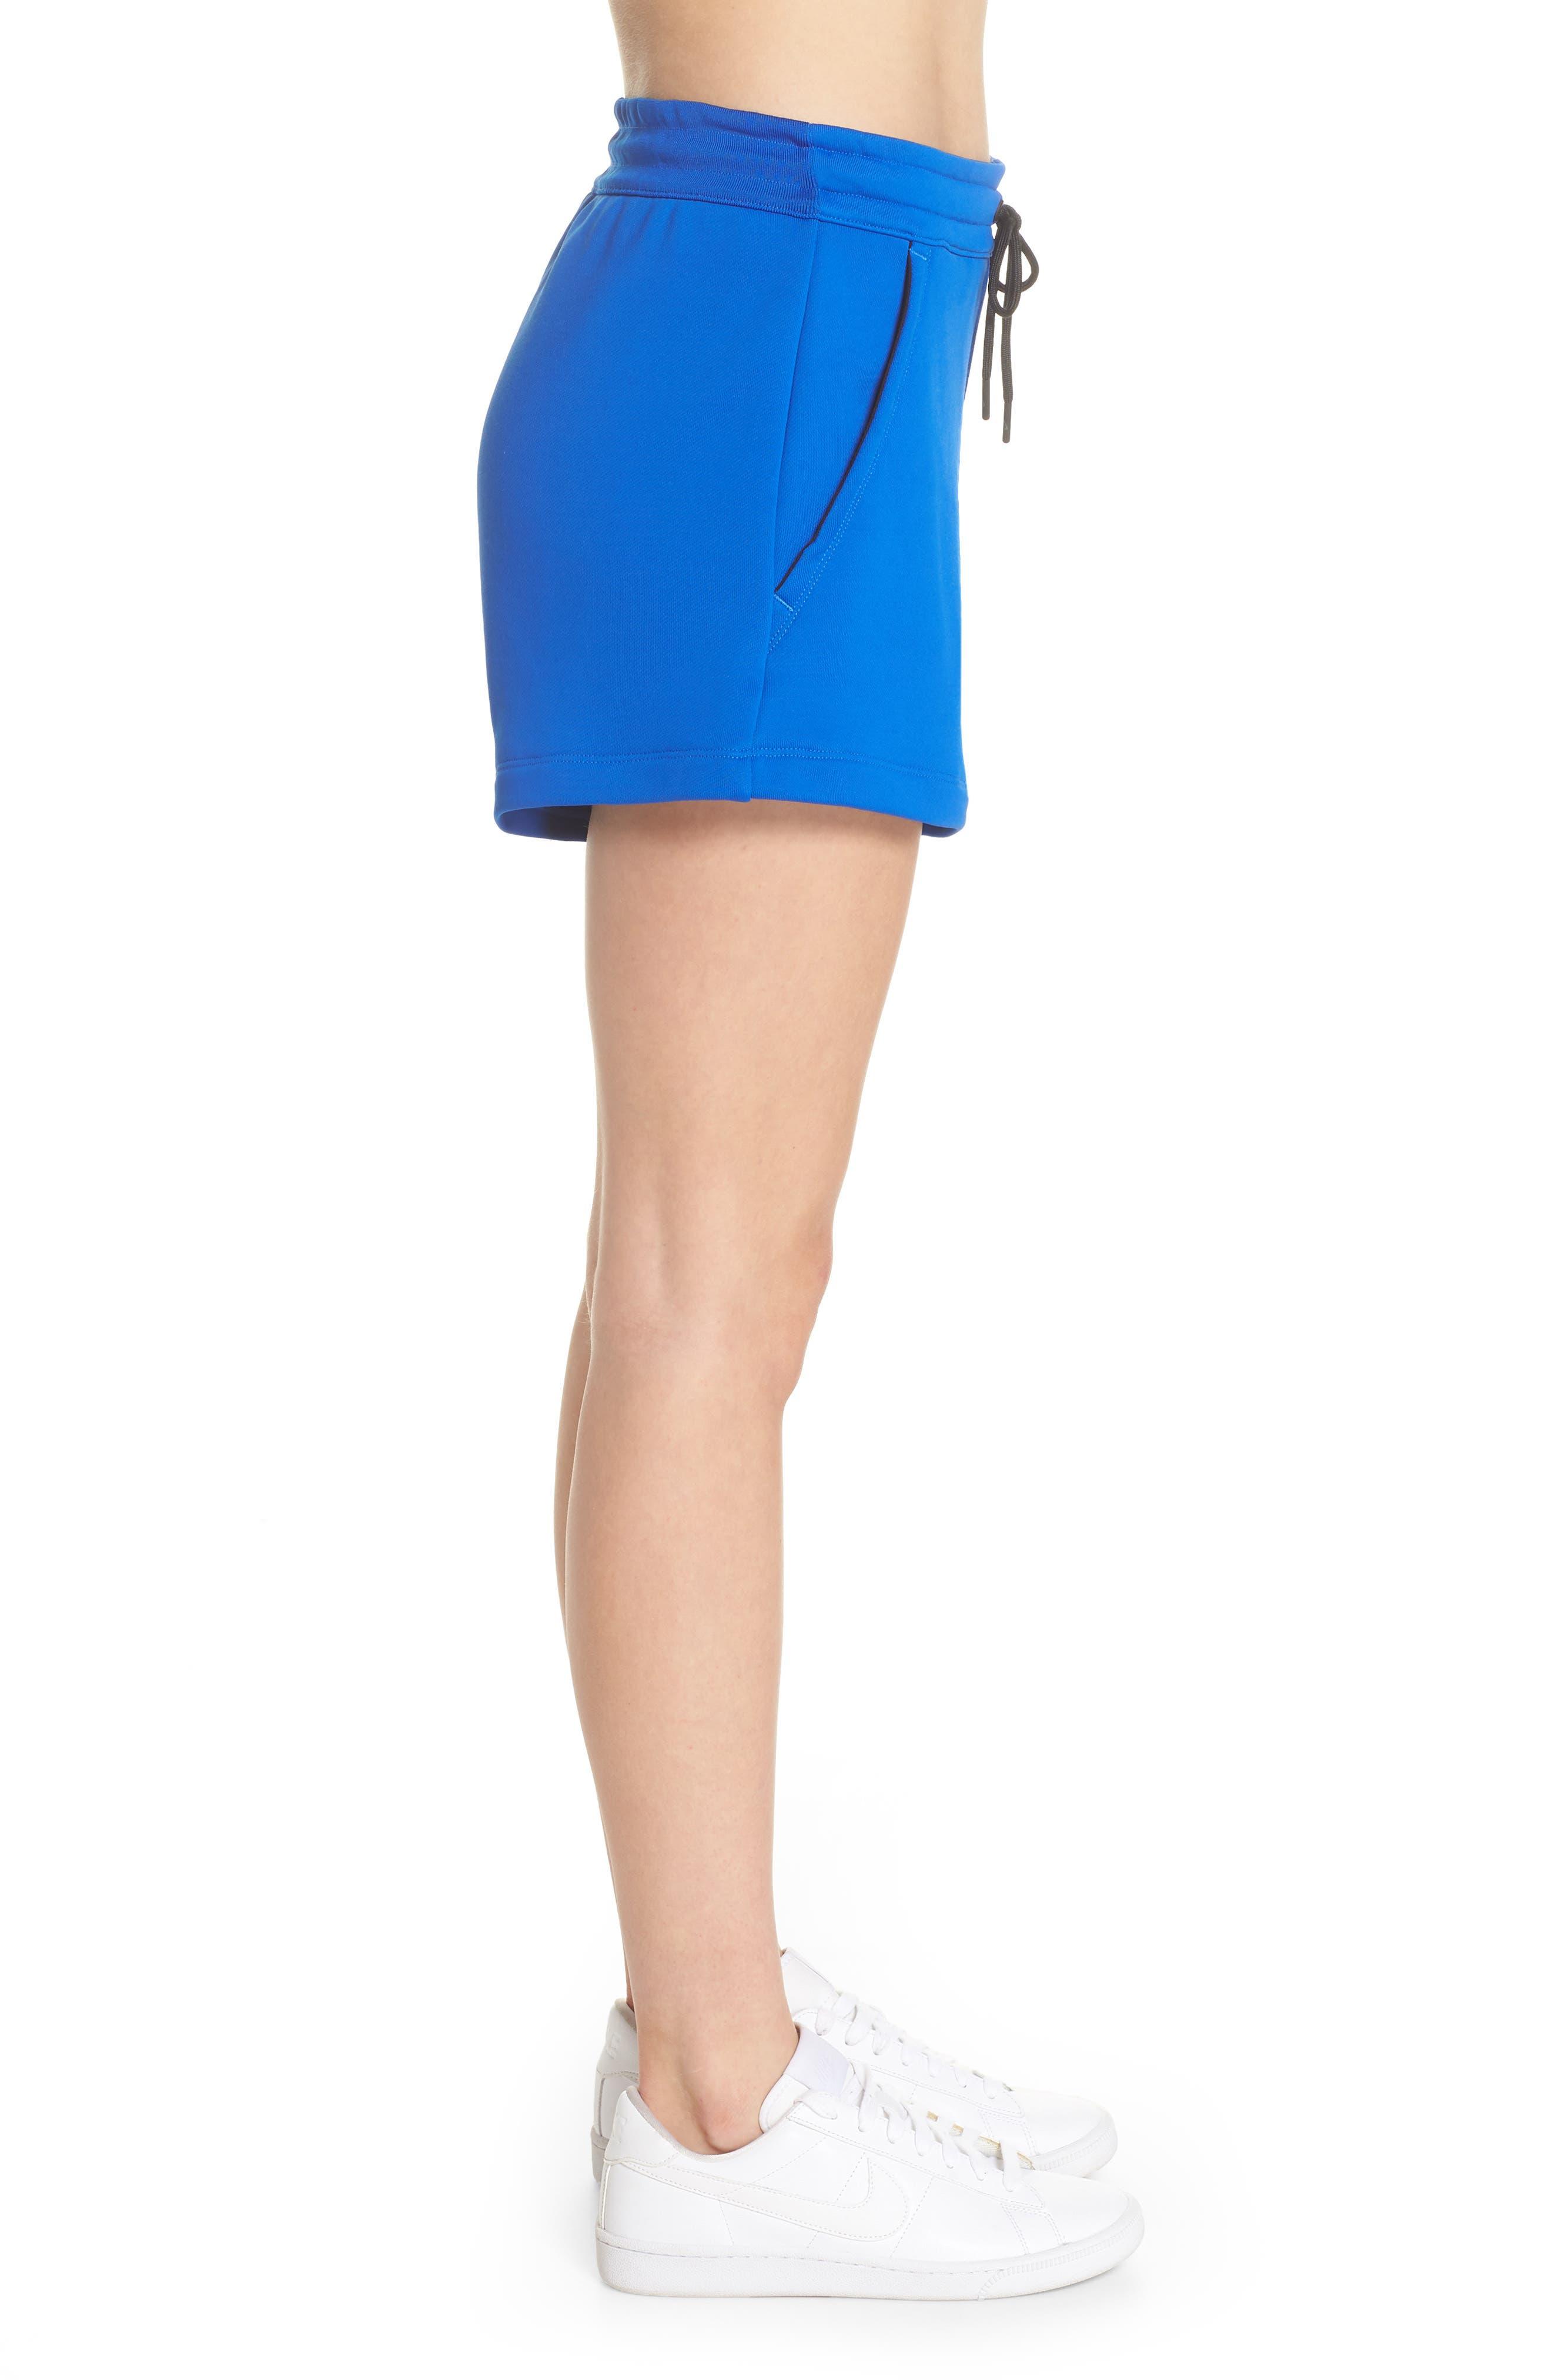 NikeLab Collection Women's Fleece Shorts,                             Alternate thumbnail 3, color,                             Hyper Cobalt/ Black